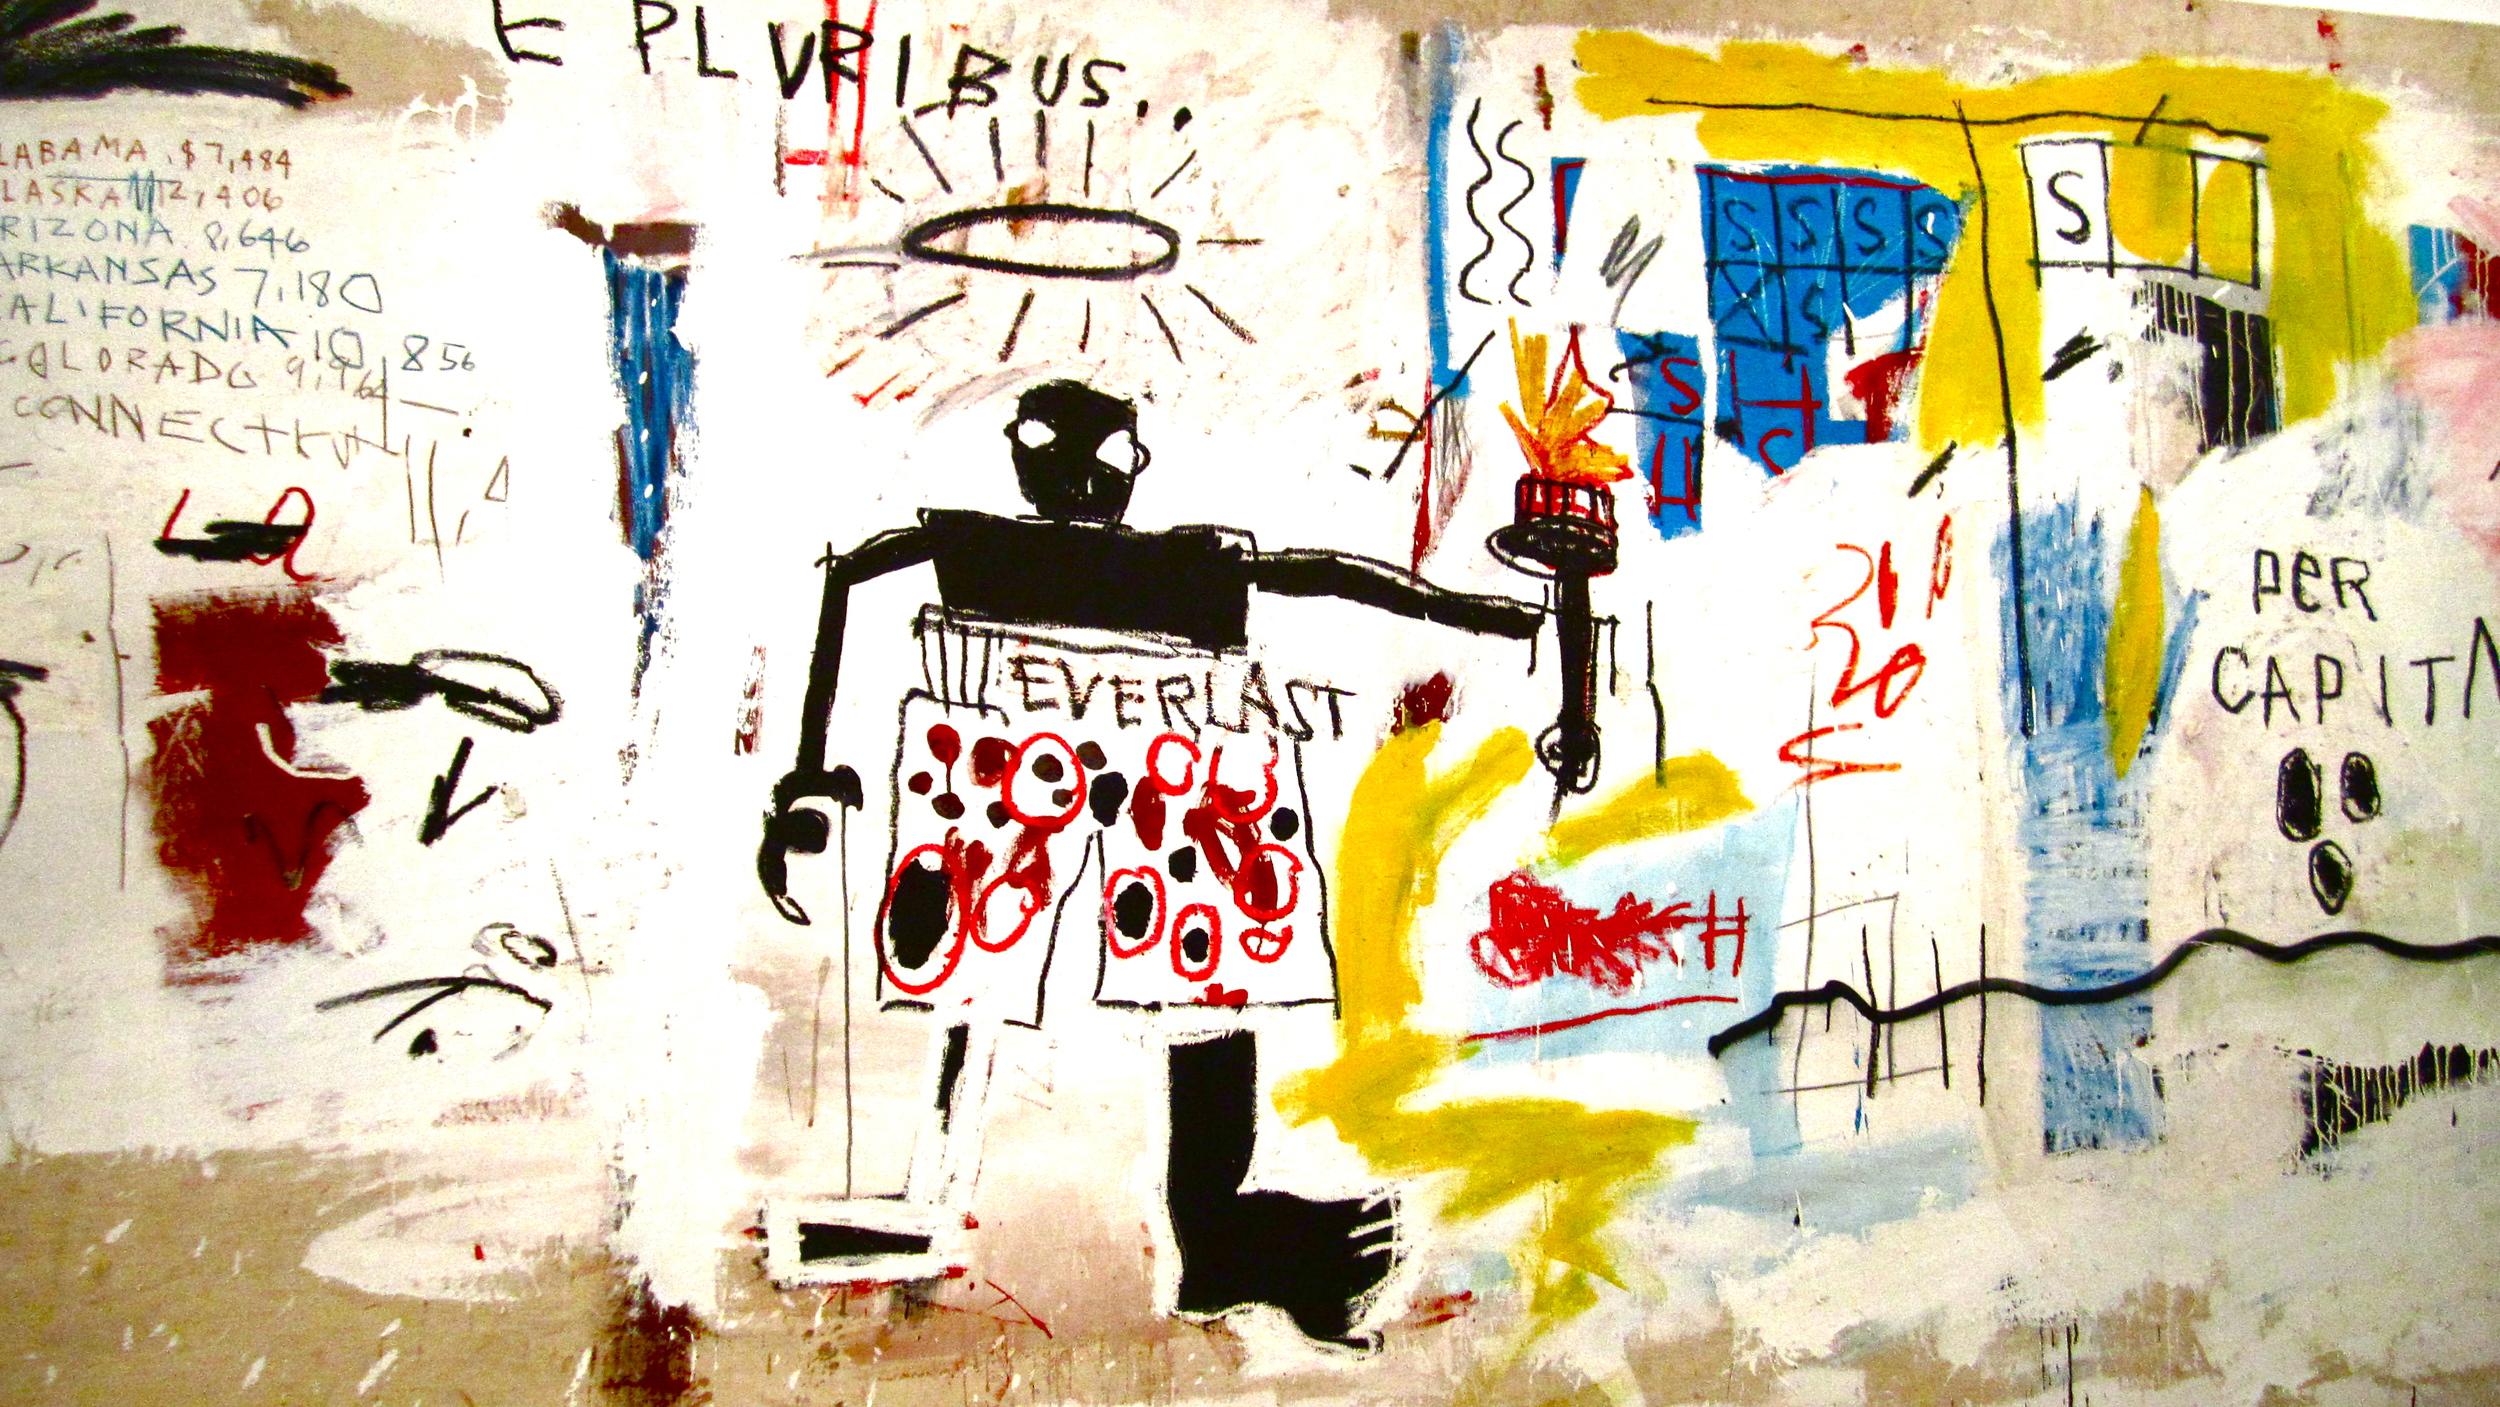 jean-michel-basquiat-jean-michel-basquiat-graffiti-free-download-gallery-hd-jean-michel-basquiat-graffiti-free-download-gallery-hd.jpg